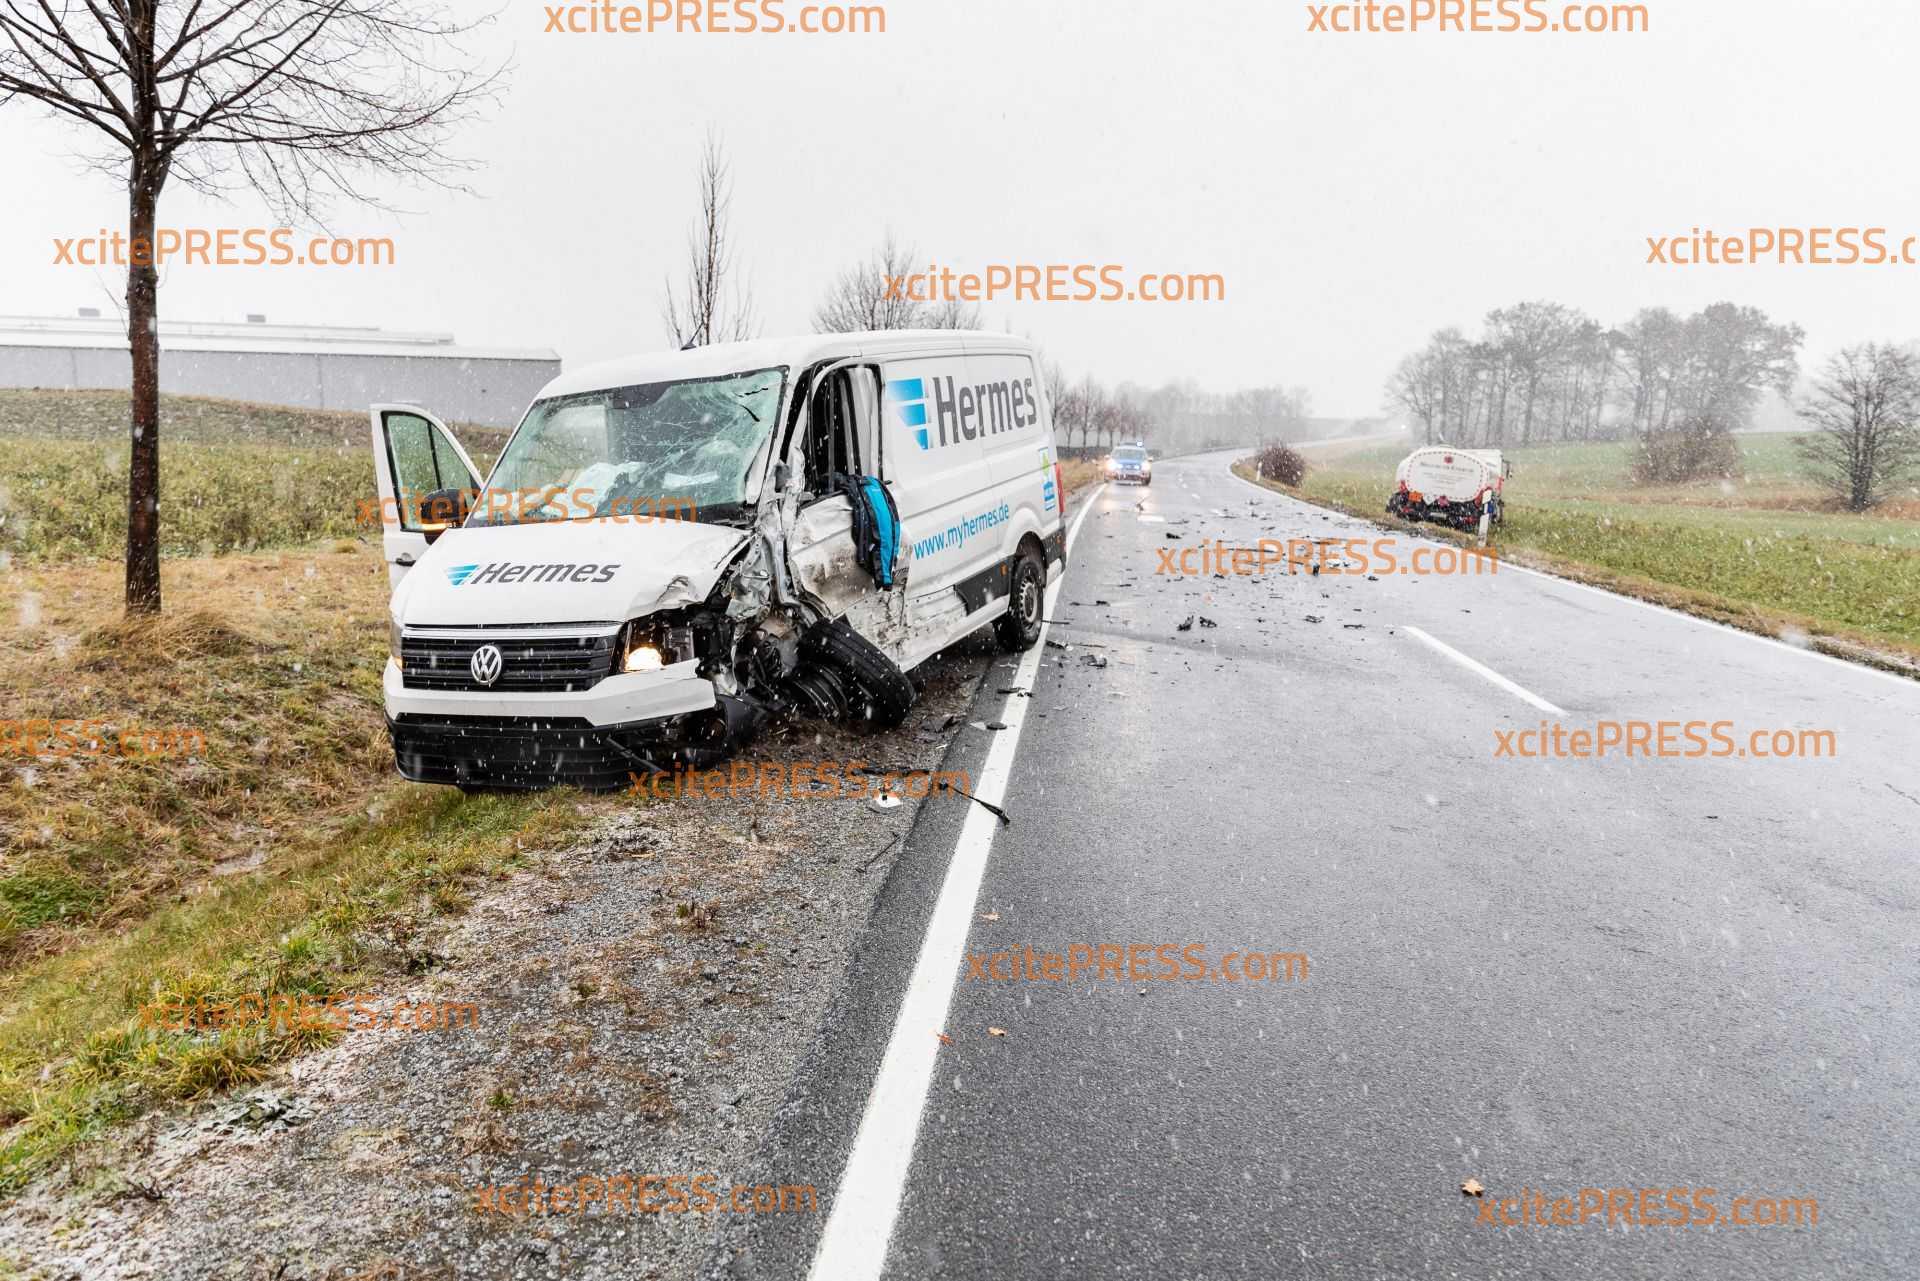 Unfallursache Schneeregen?! Transporter kracht gegen LKW: 2 Verletzte in Krankenhaus verbracht